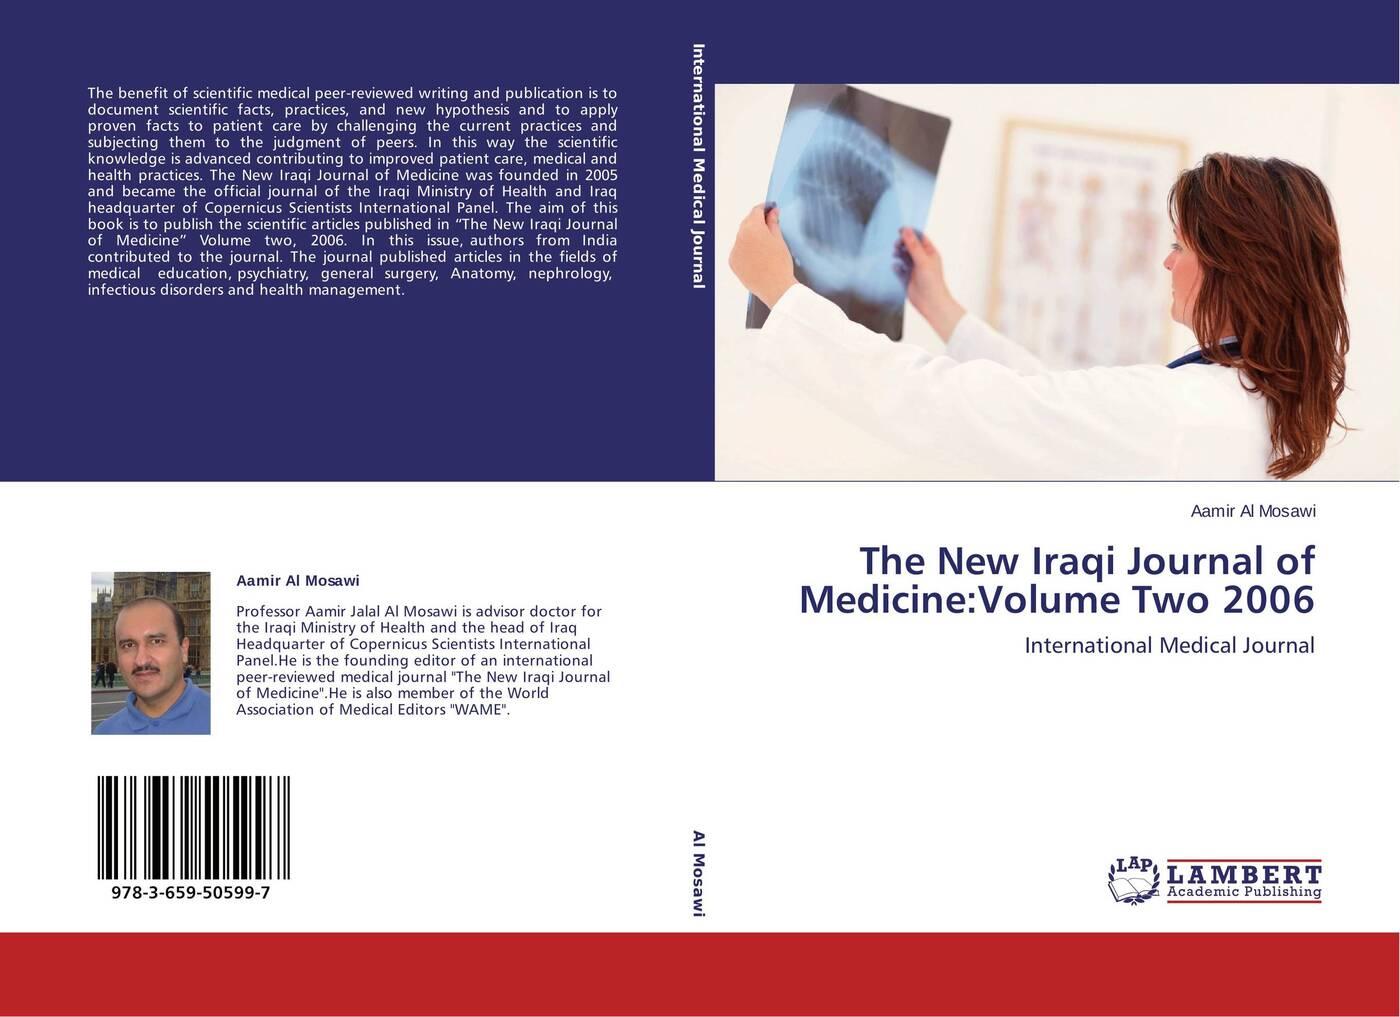 Aamir Al Mosawi The New Iraqi Journal of Medicine:Volume Two 2006